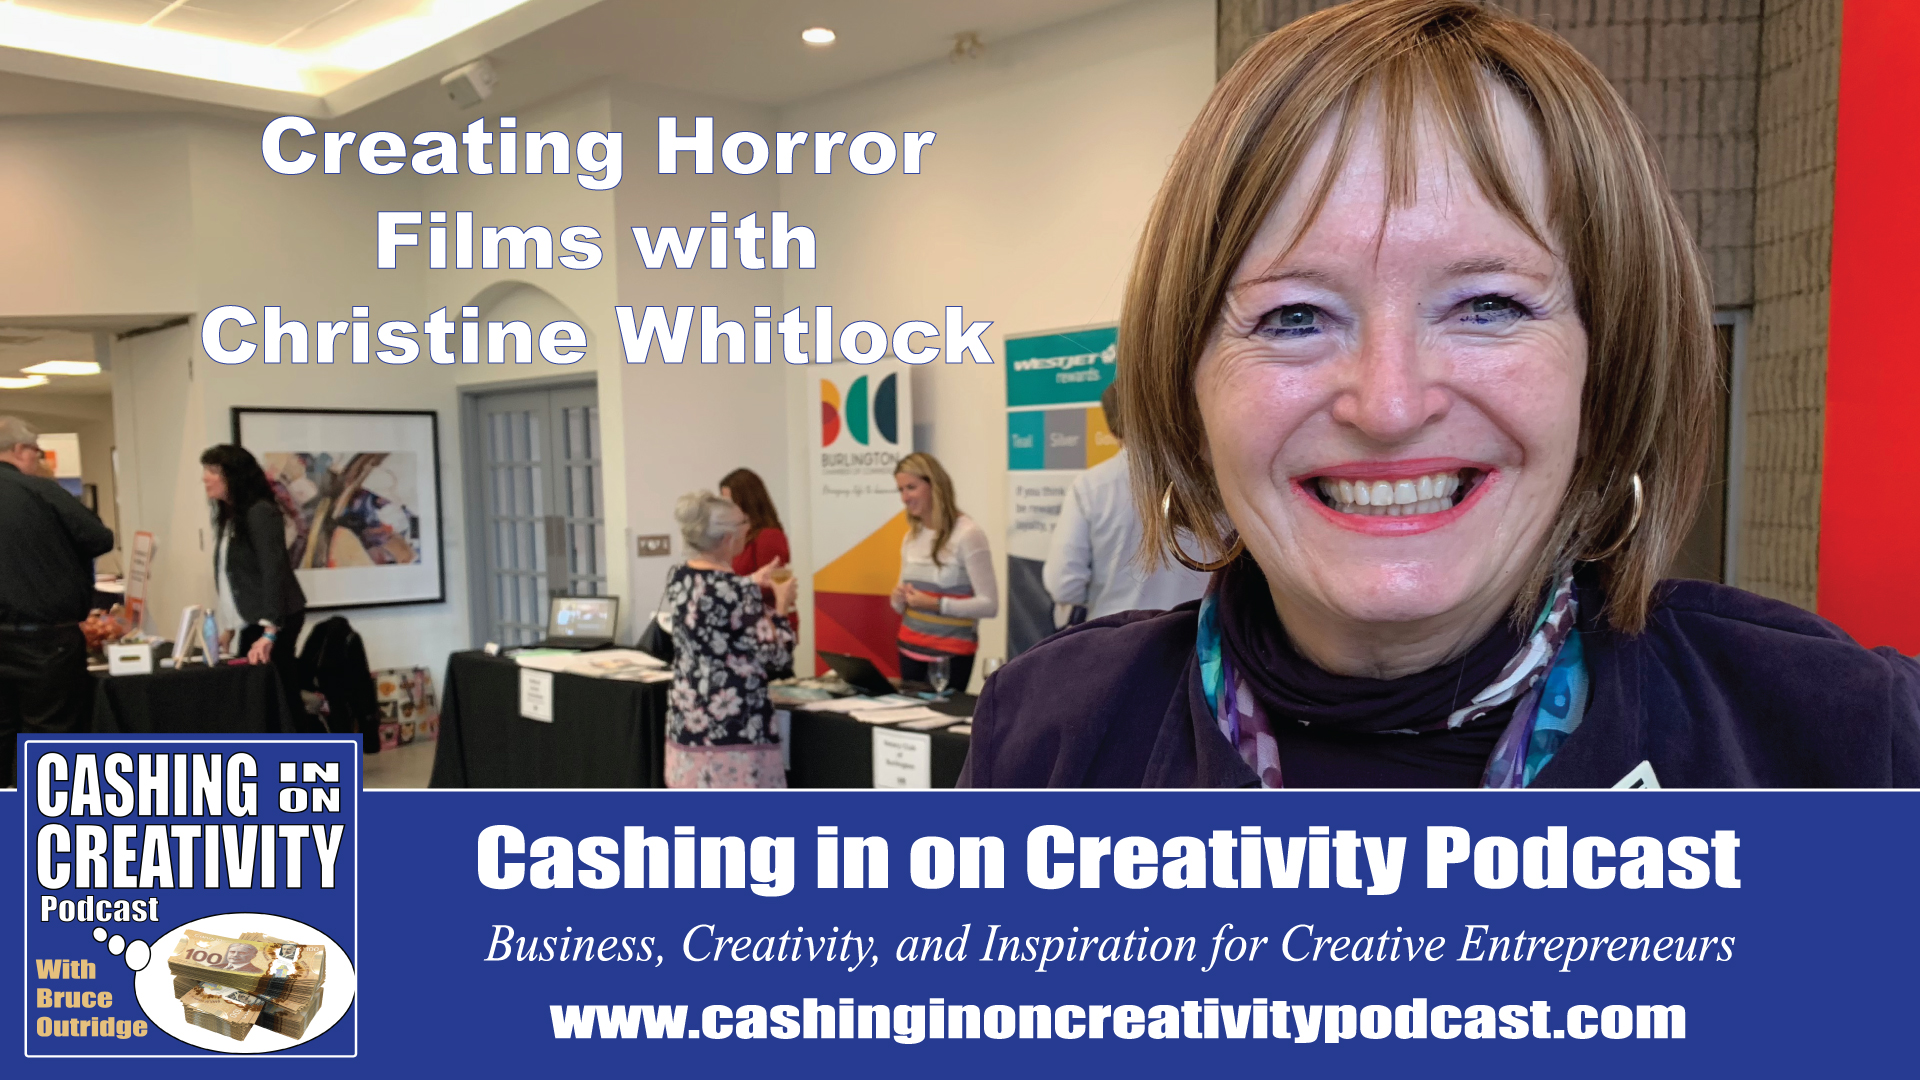 Christine Whitlock